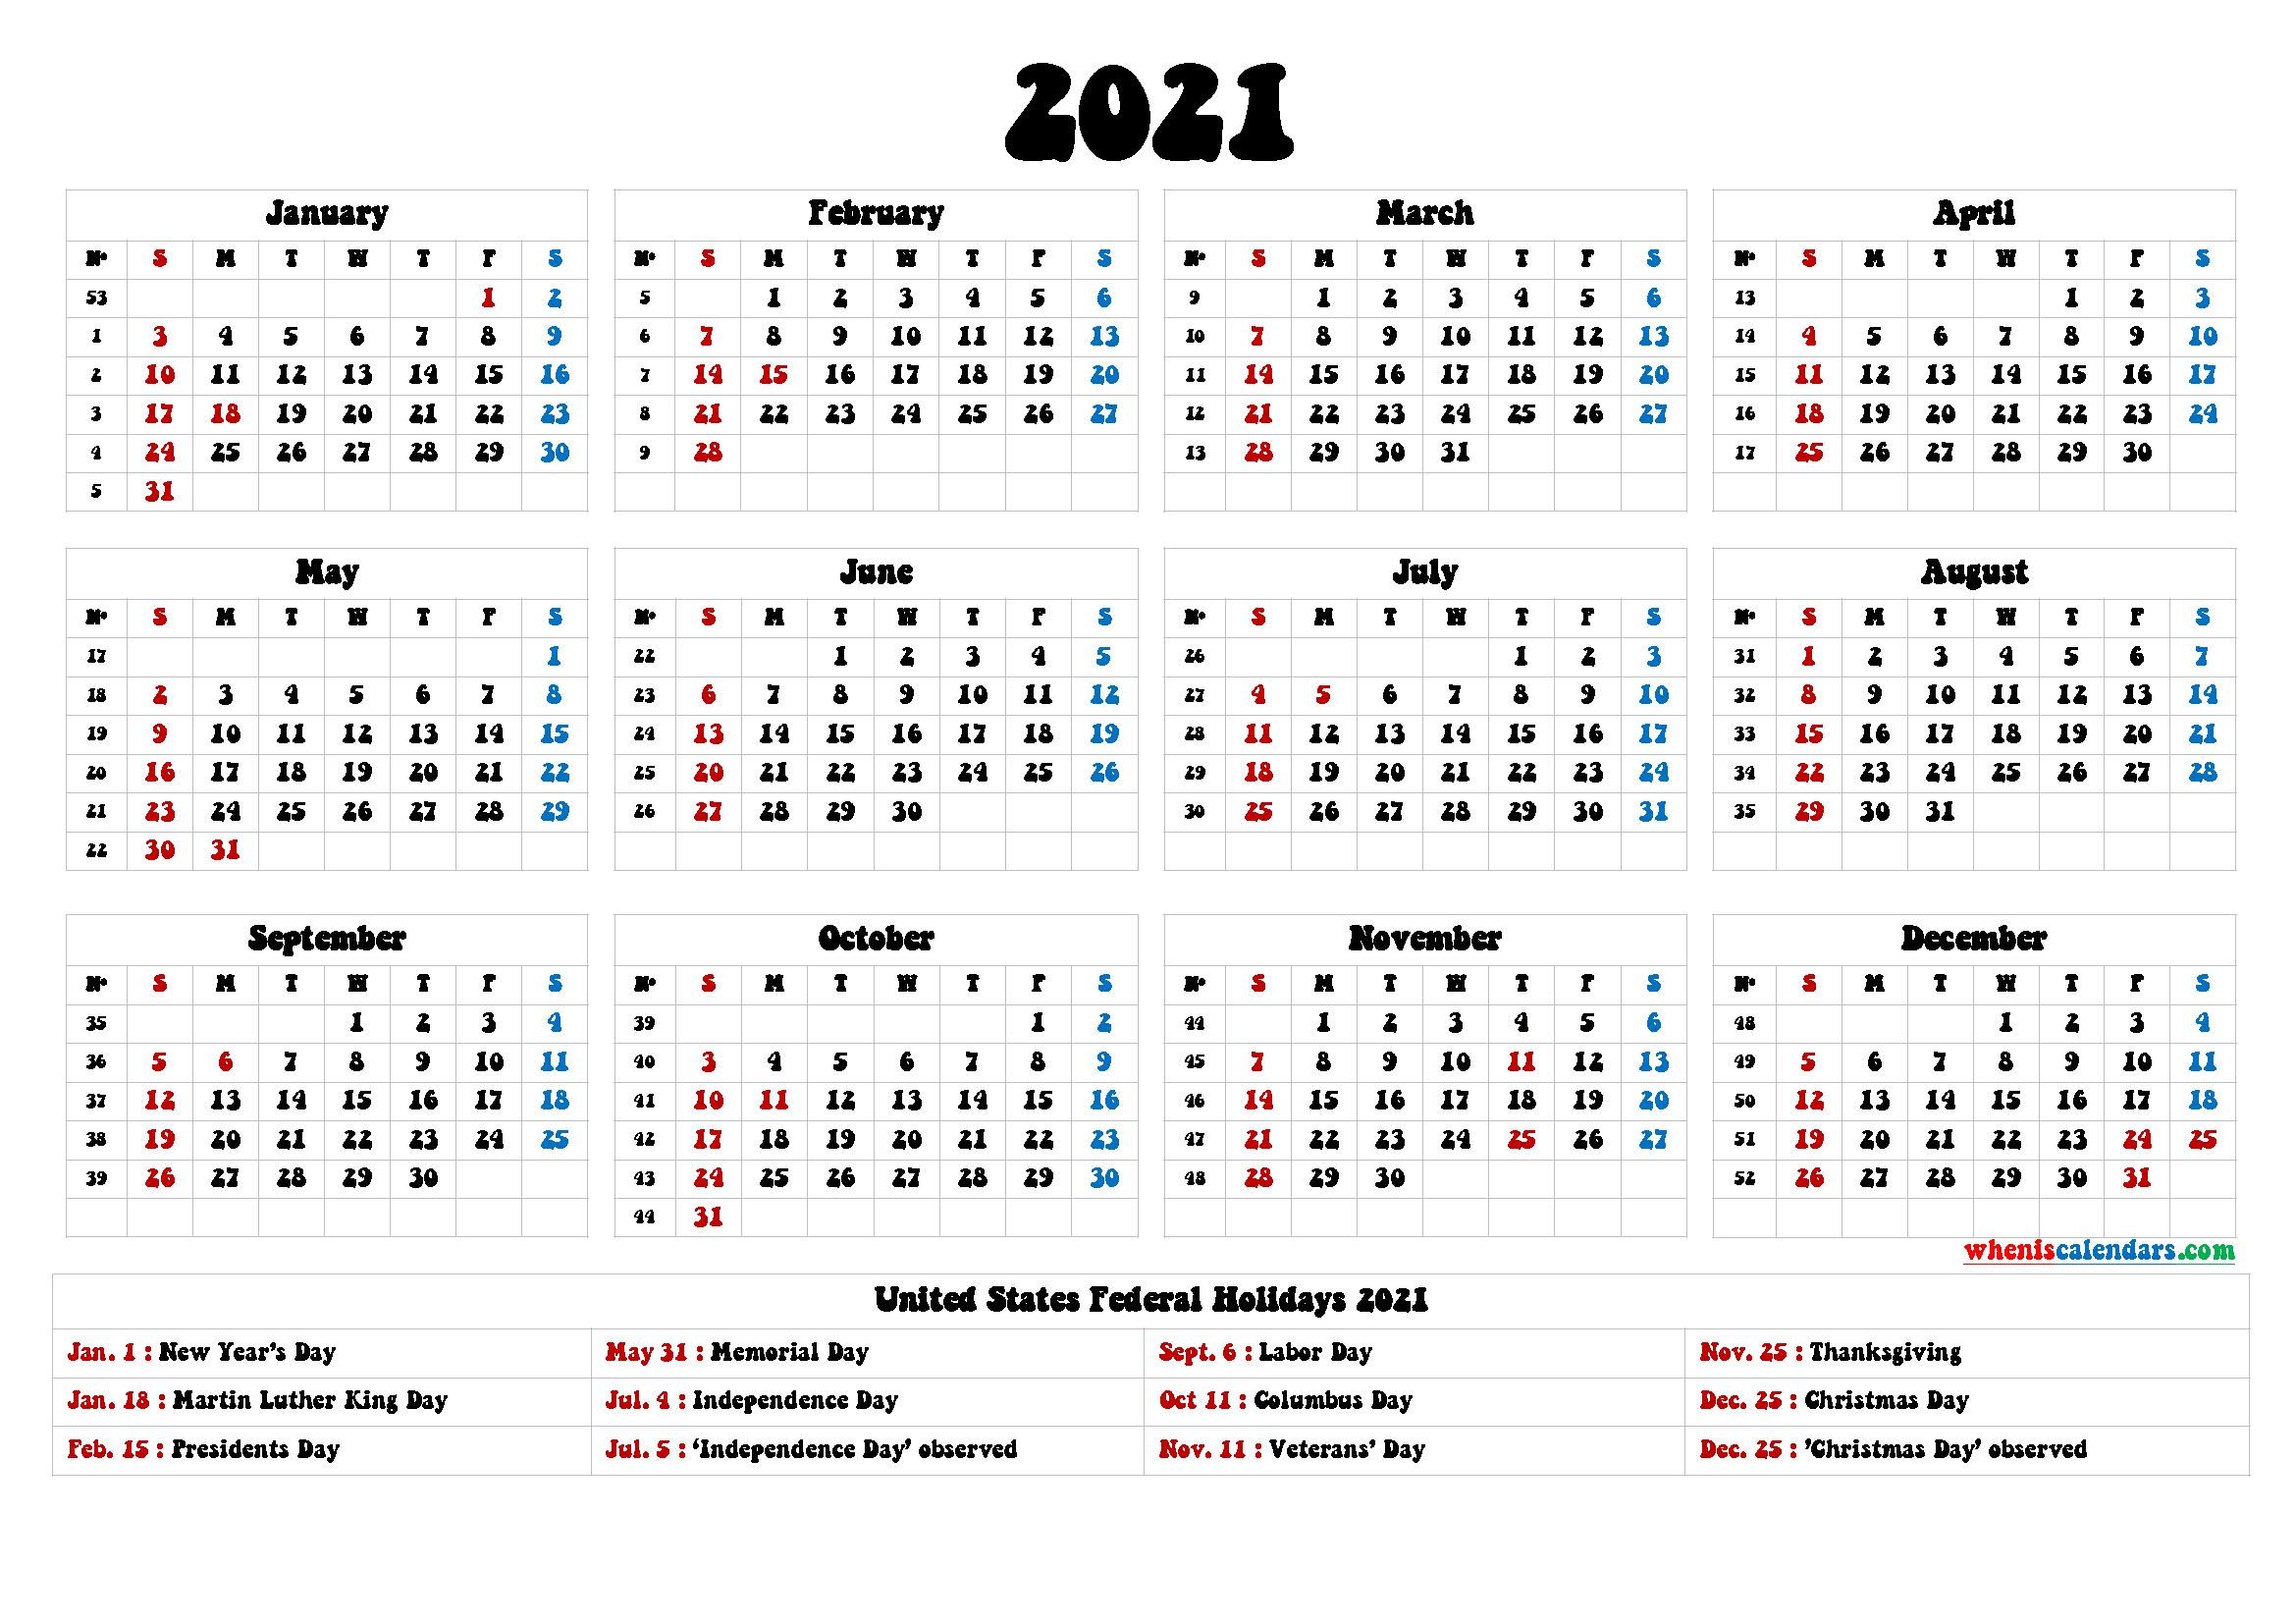 2021 Calendar With Holidays Printable - 6 Templates   Free-4 X 6 Calendars 2021